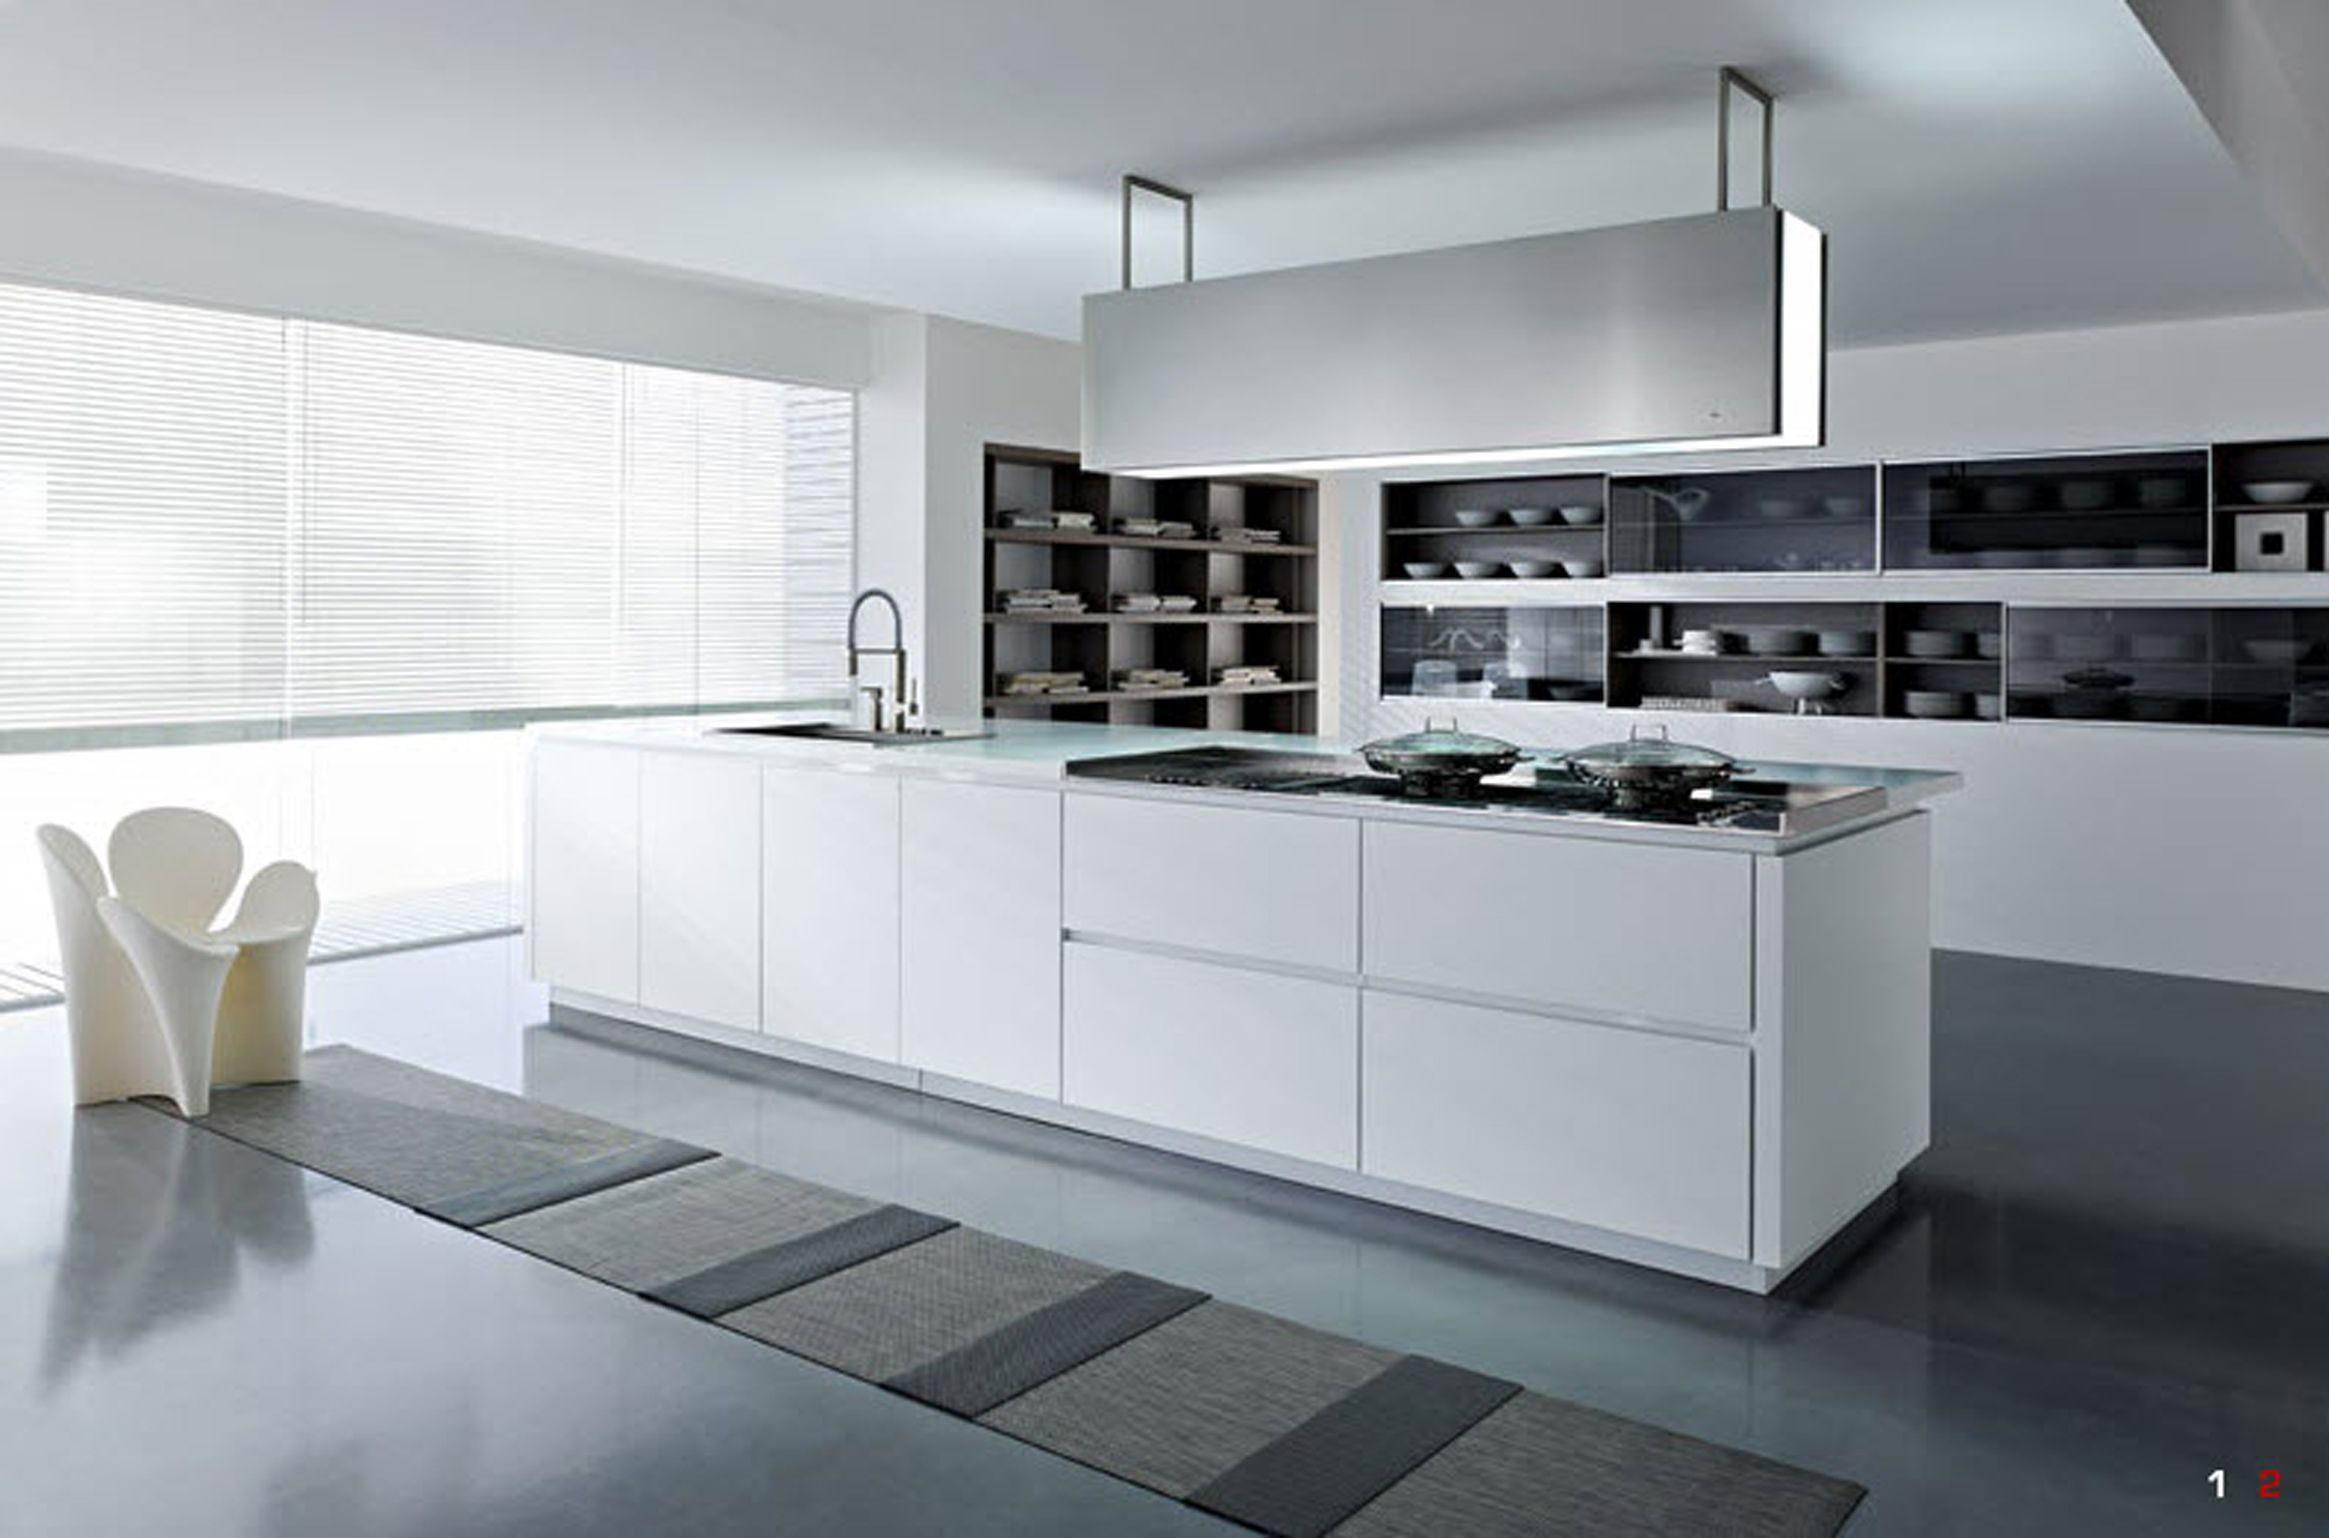 L shaped kitchen design ideas kitchendesignideas kitchen